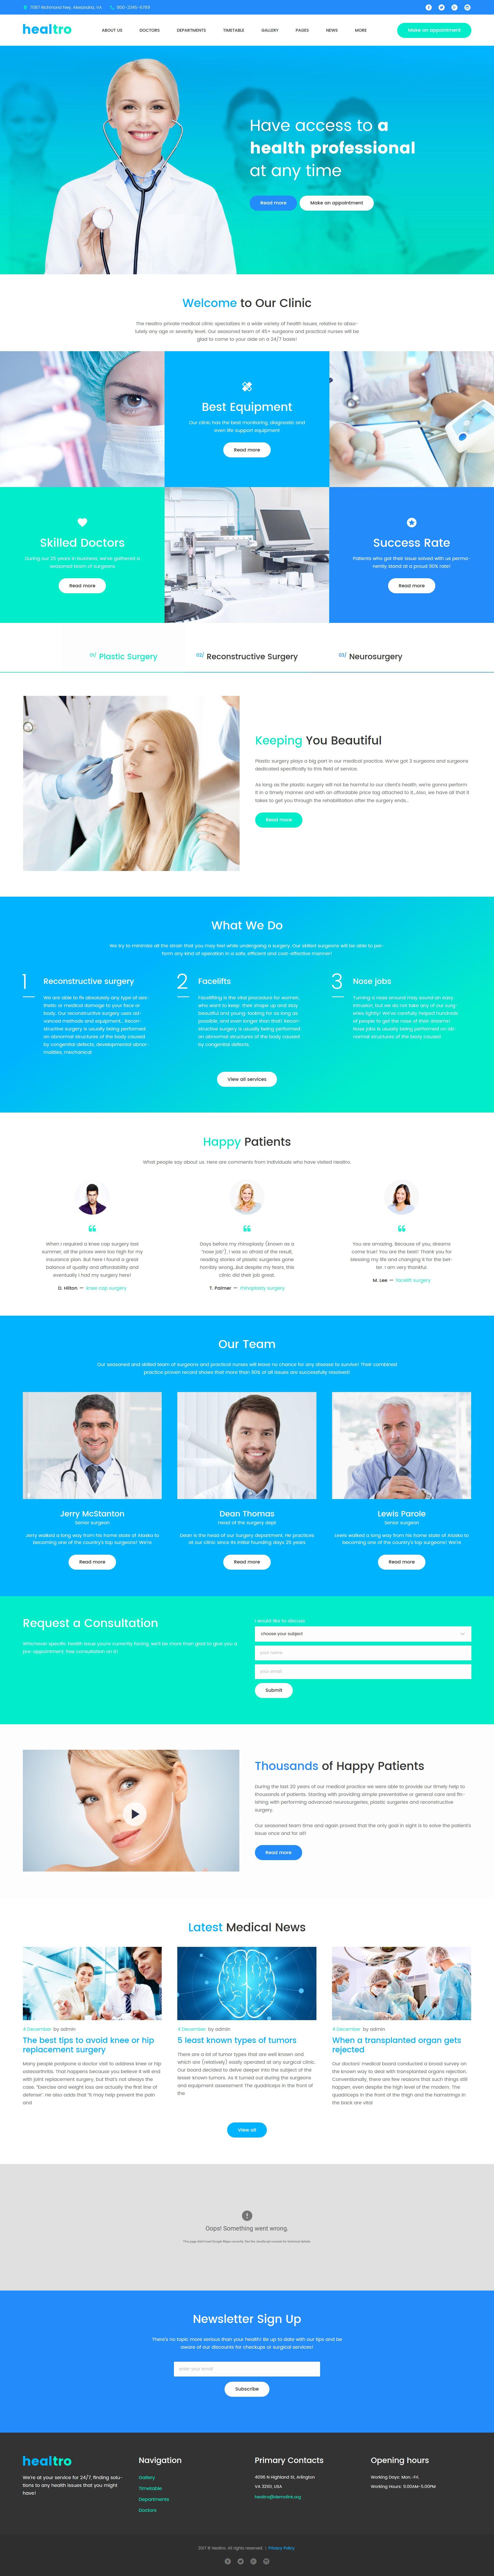 Healtro - Private Medical Clinic Responsive WordPress Theme - screenshot